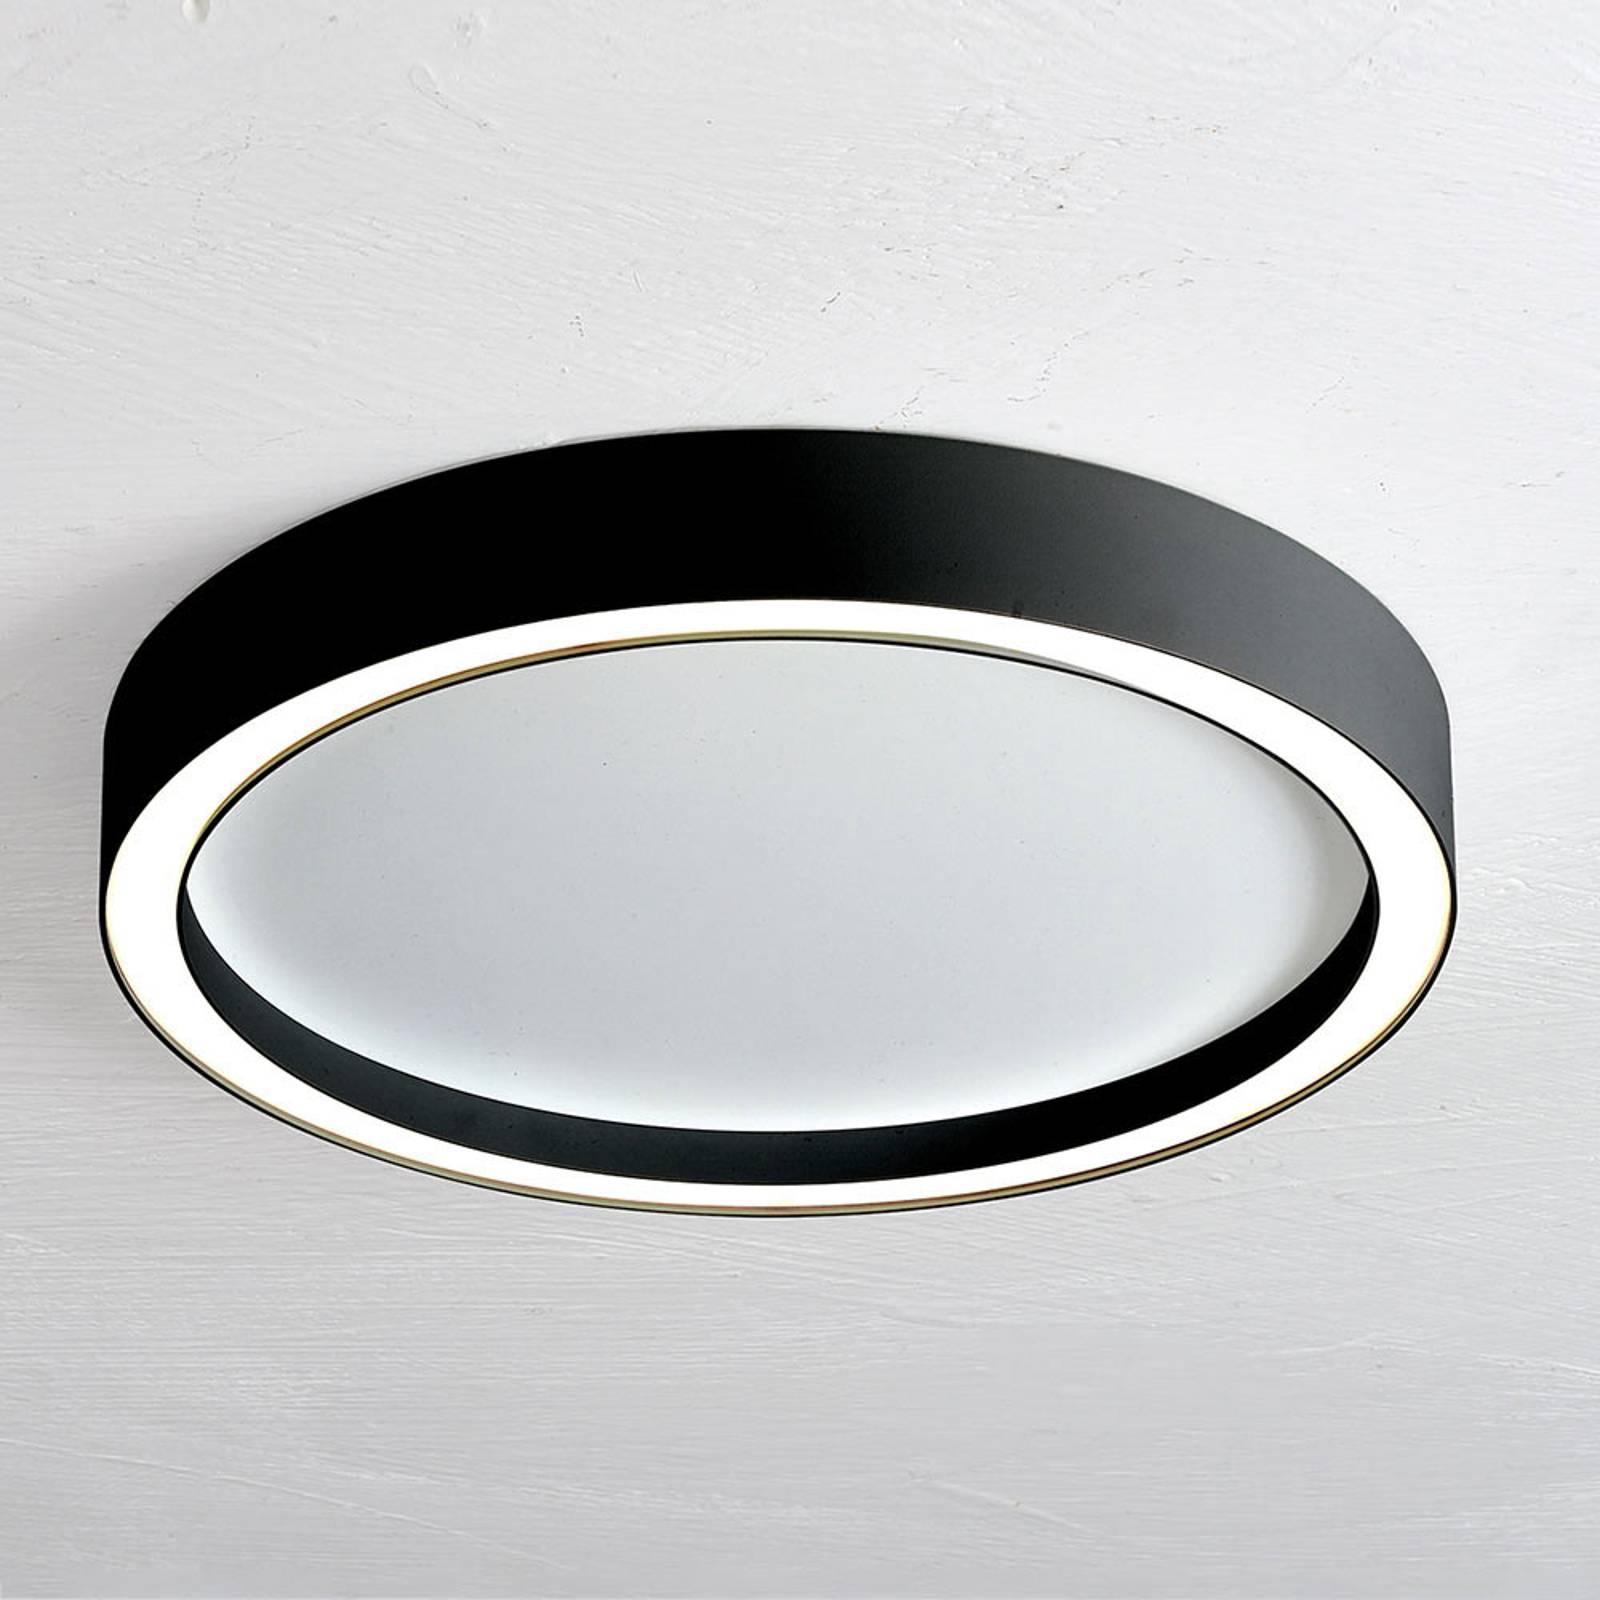 Bopp Aura LED plafondlamp Ø 40cm wit/zwart